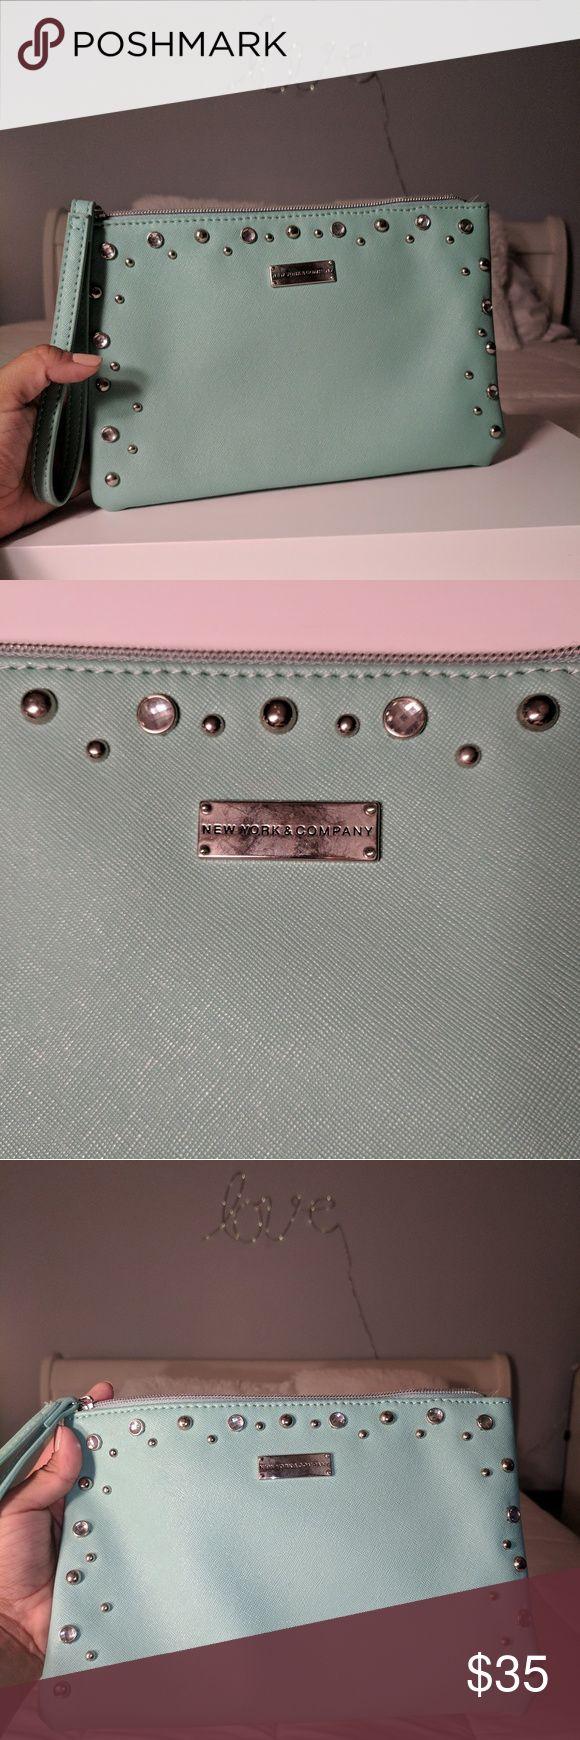 Mint blue studded clutch with wrist strap Mint blue New York & Company studded clutch with wrist strap. Used once. New York & Company Bags Clutches & Wristlets